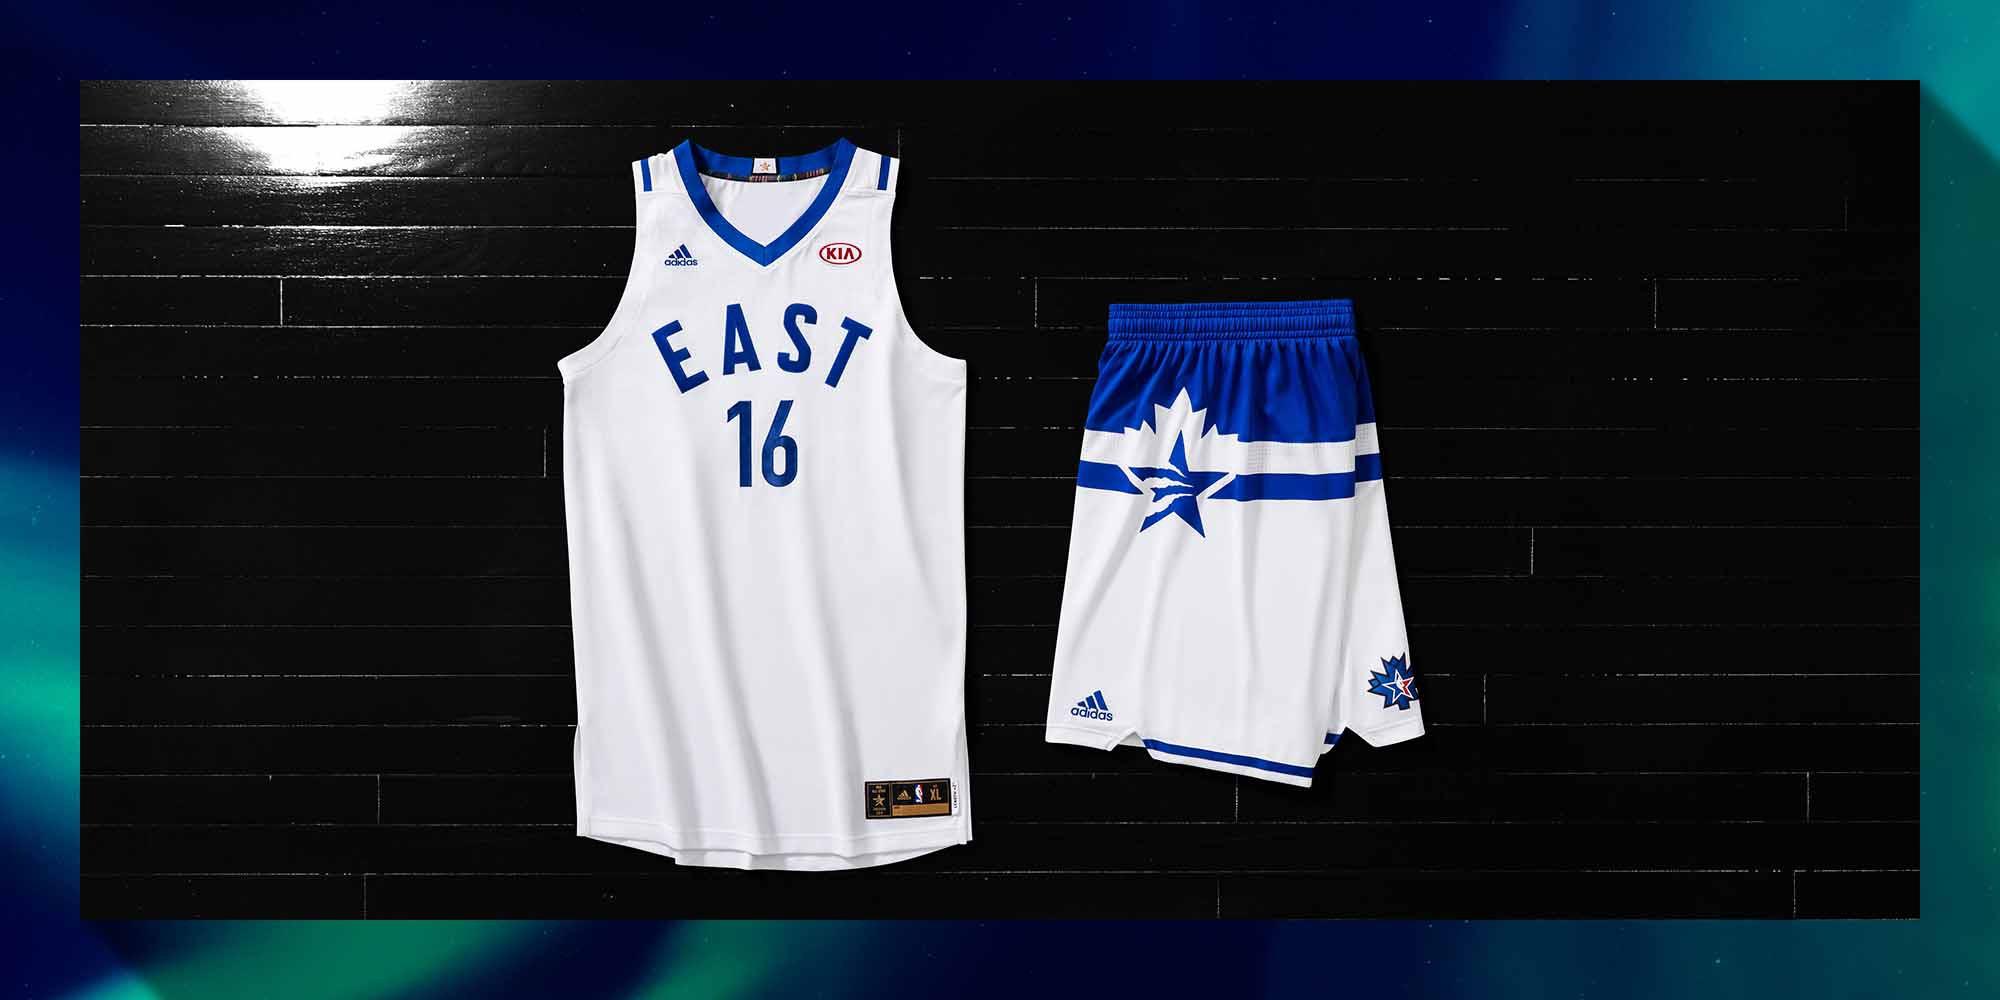 НБА представила форму для Матча всех звезд-2016